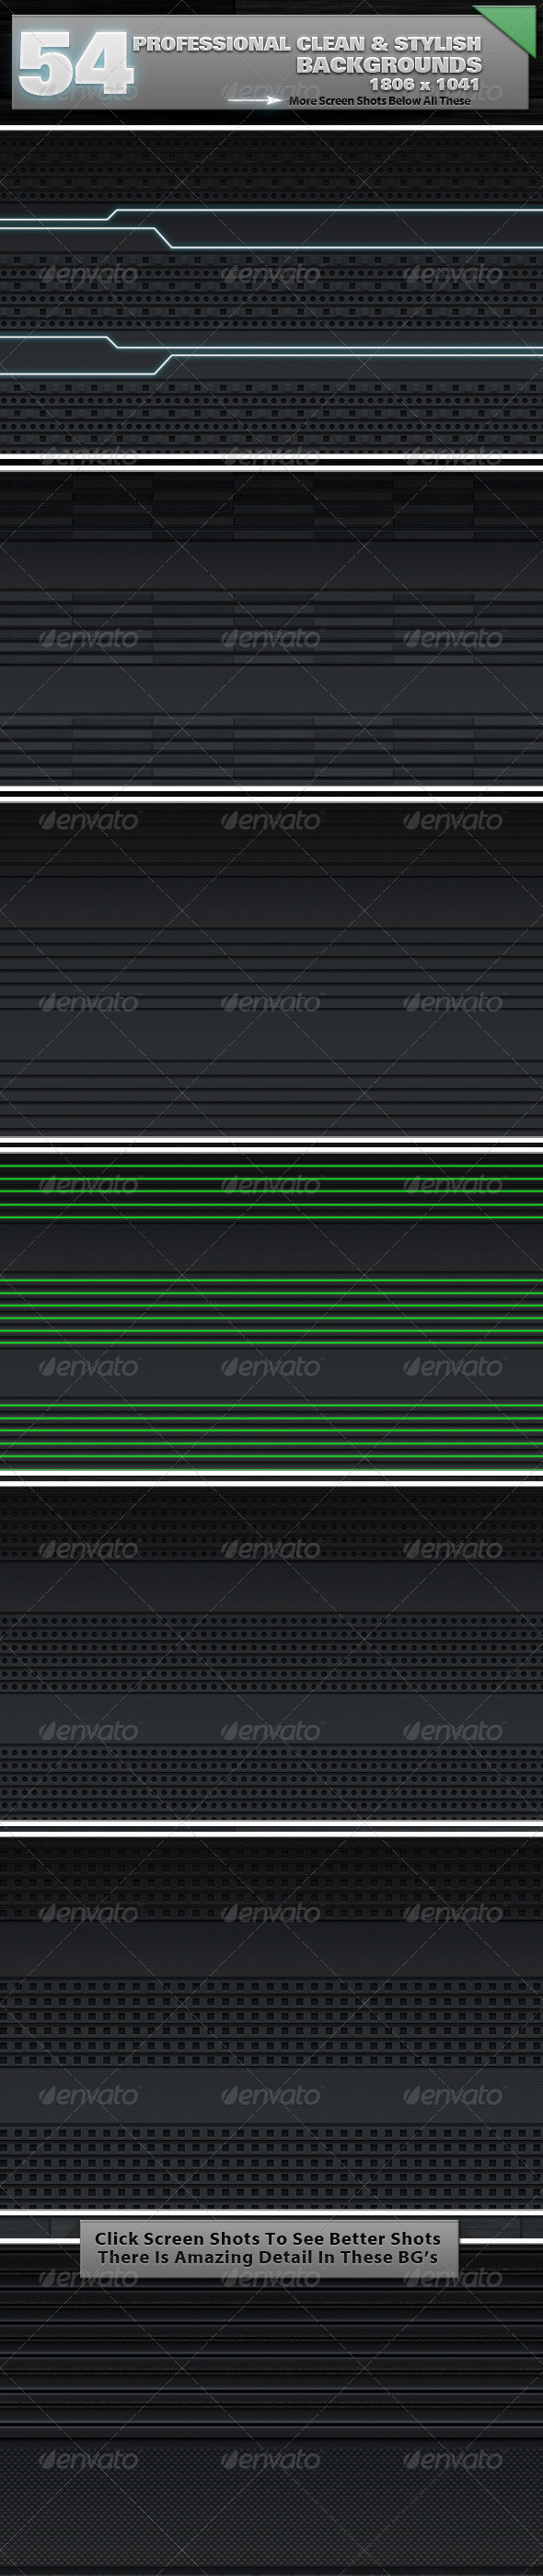 Graphic River 54 Premium Clean Backgrounds Bundle Graphics -  Backgrounds 504392